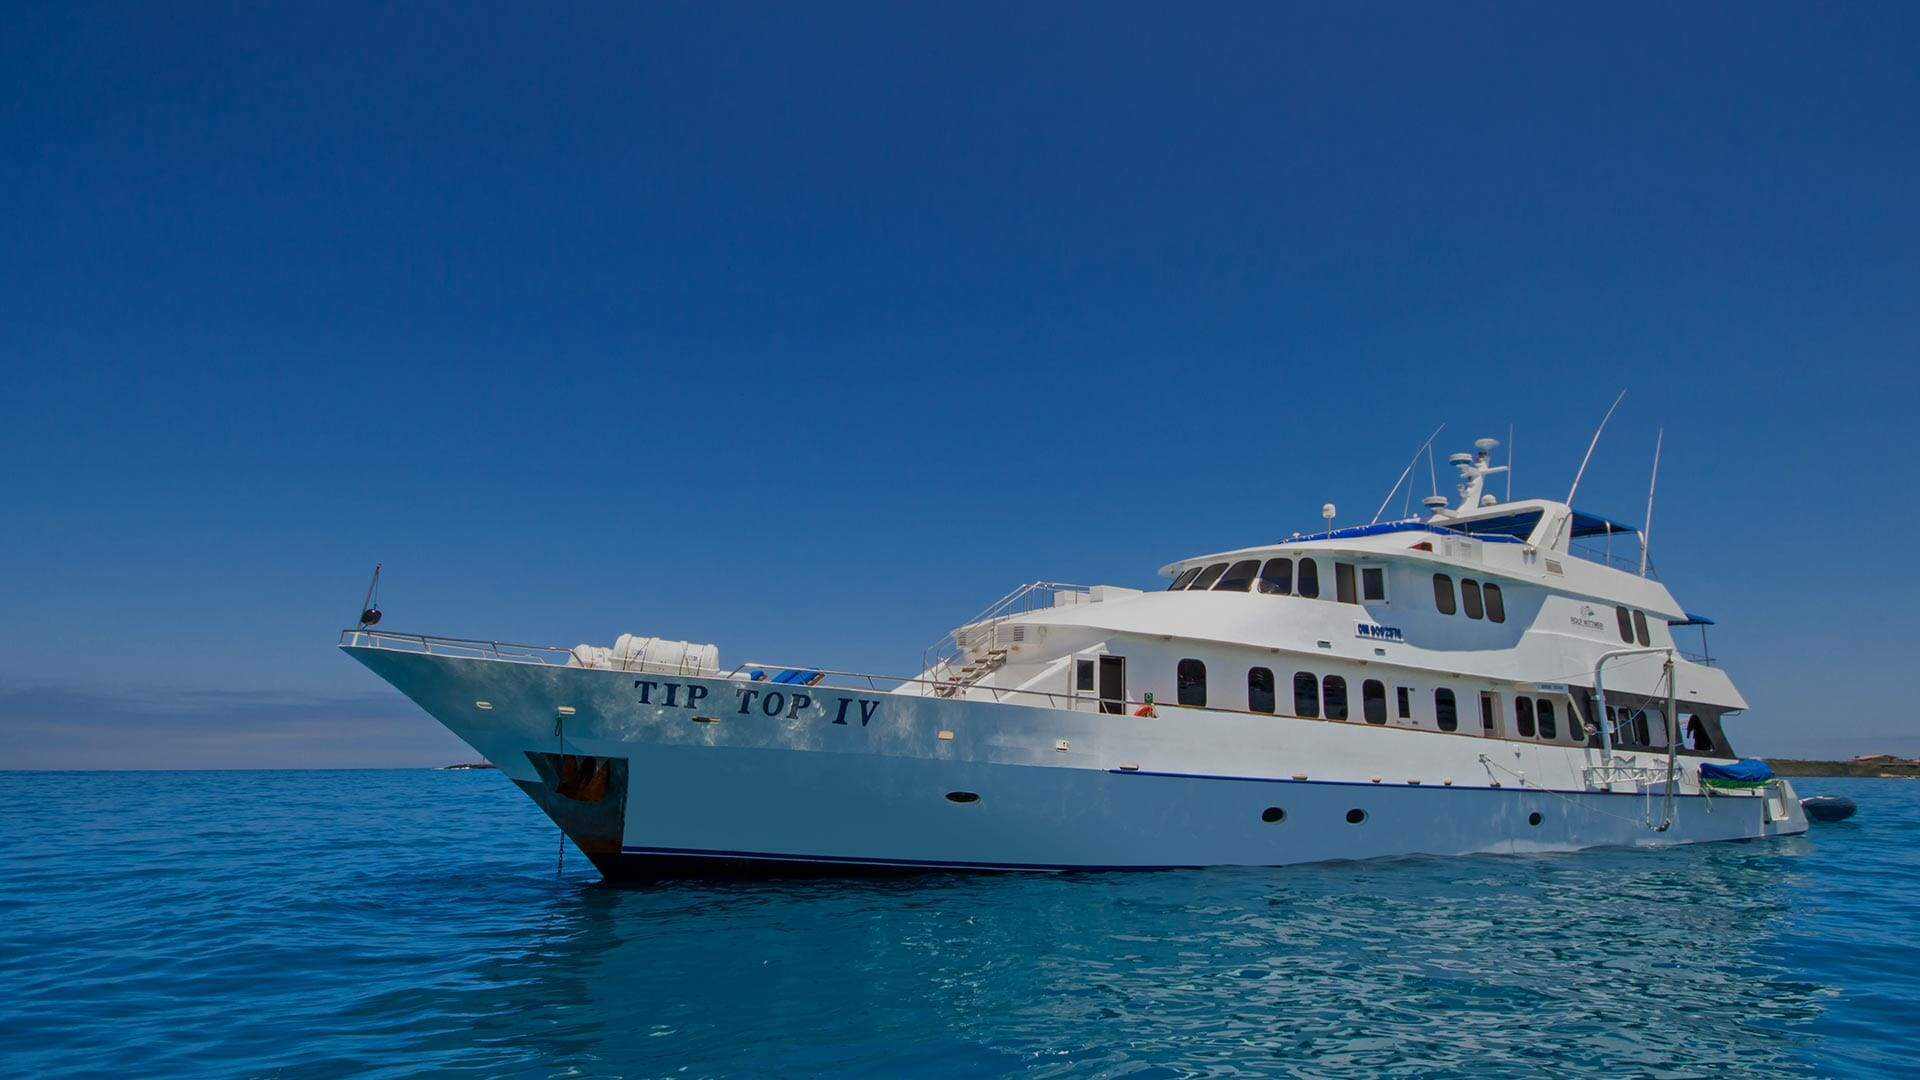 Tip Top IV Yacht